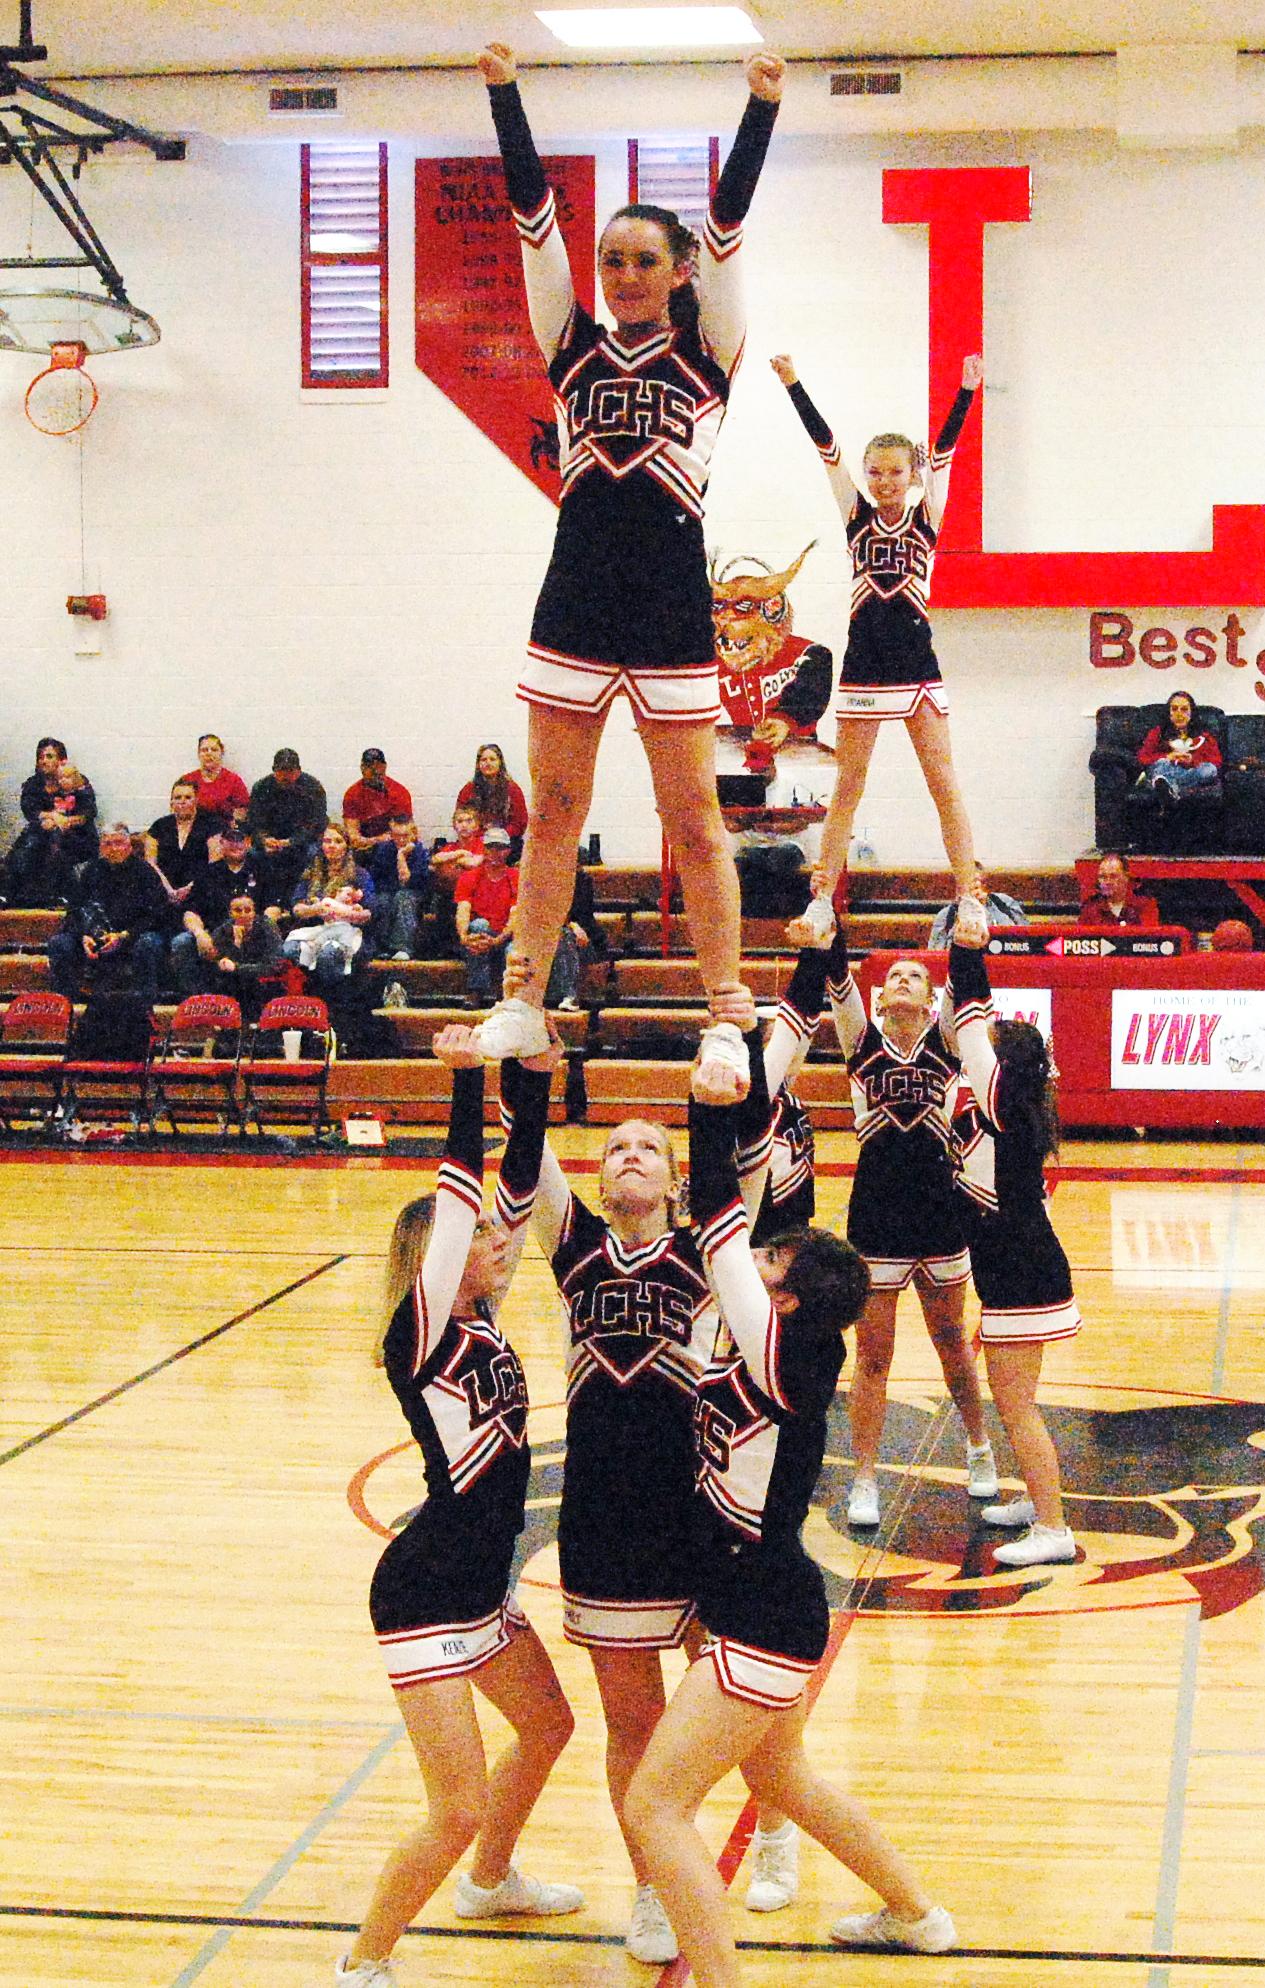 LCHS cheerleaders turning heads